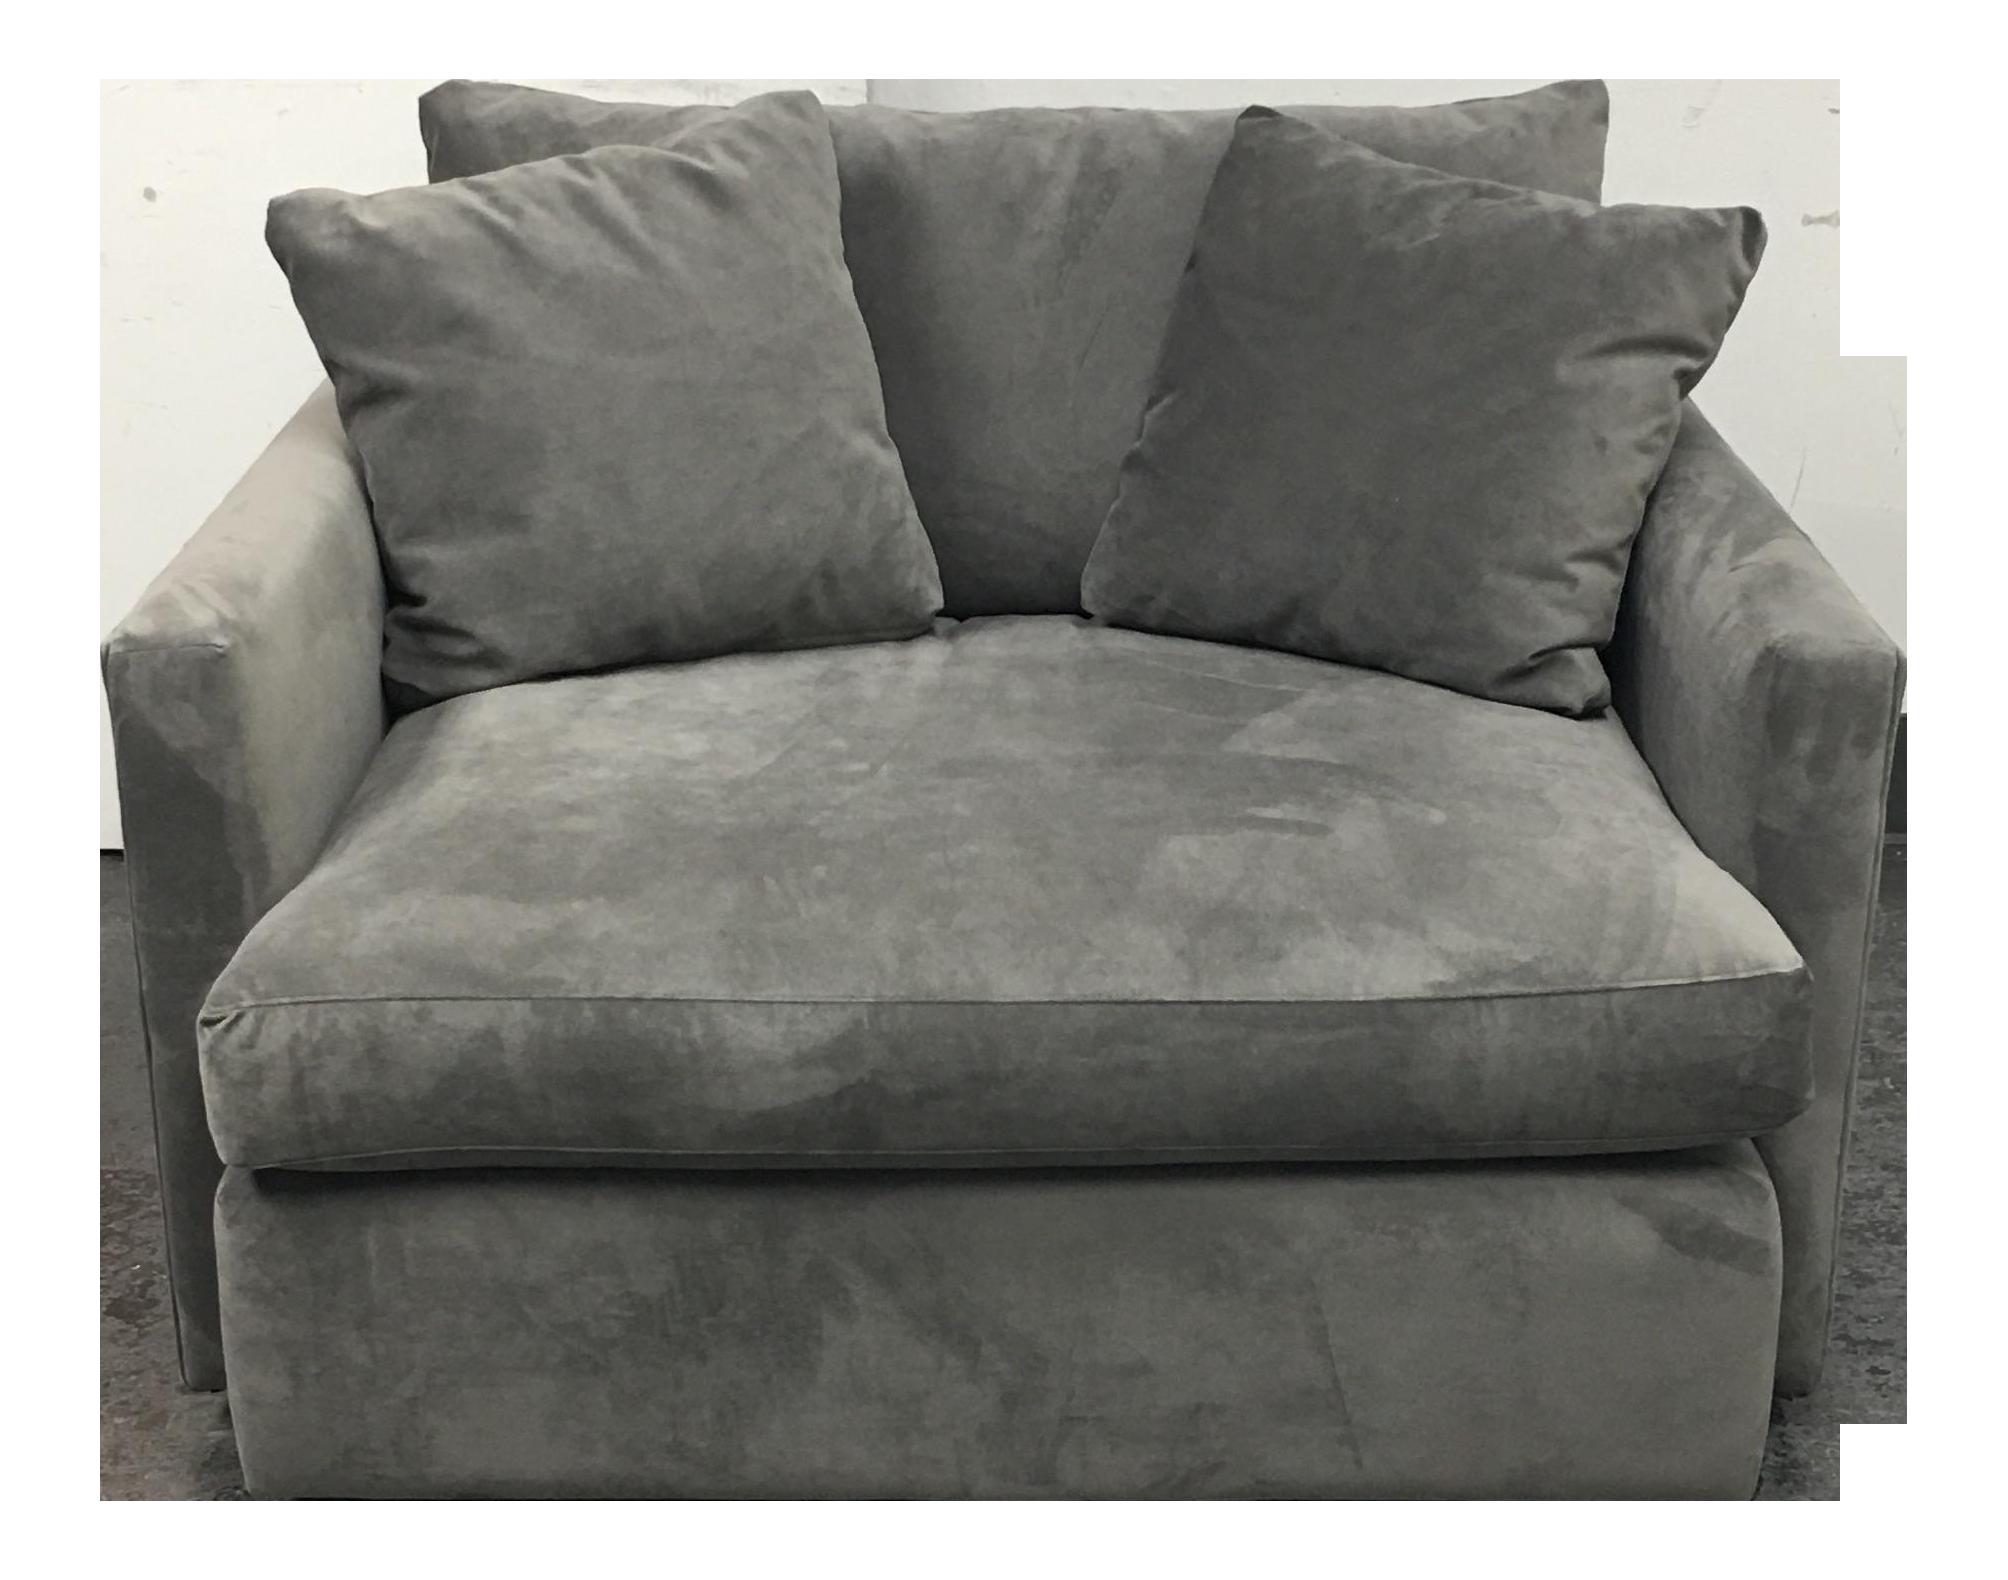 Crate Barrel Velvet Lounge Chair Chairish